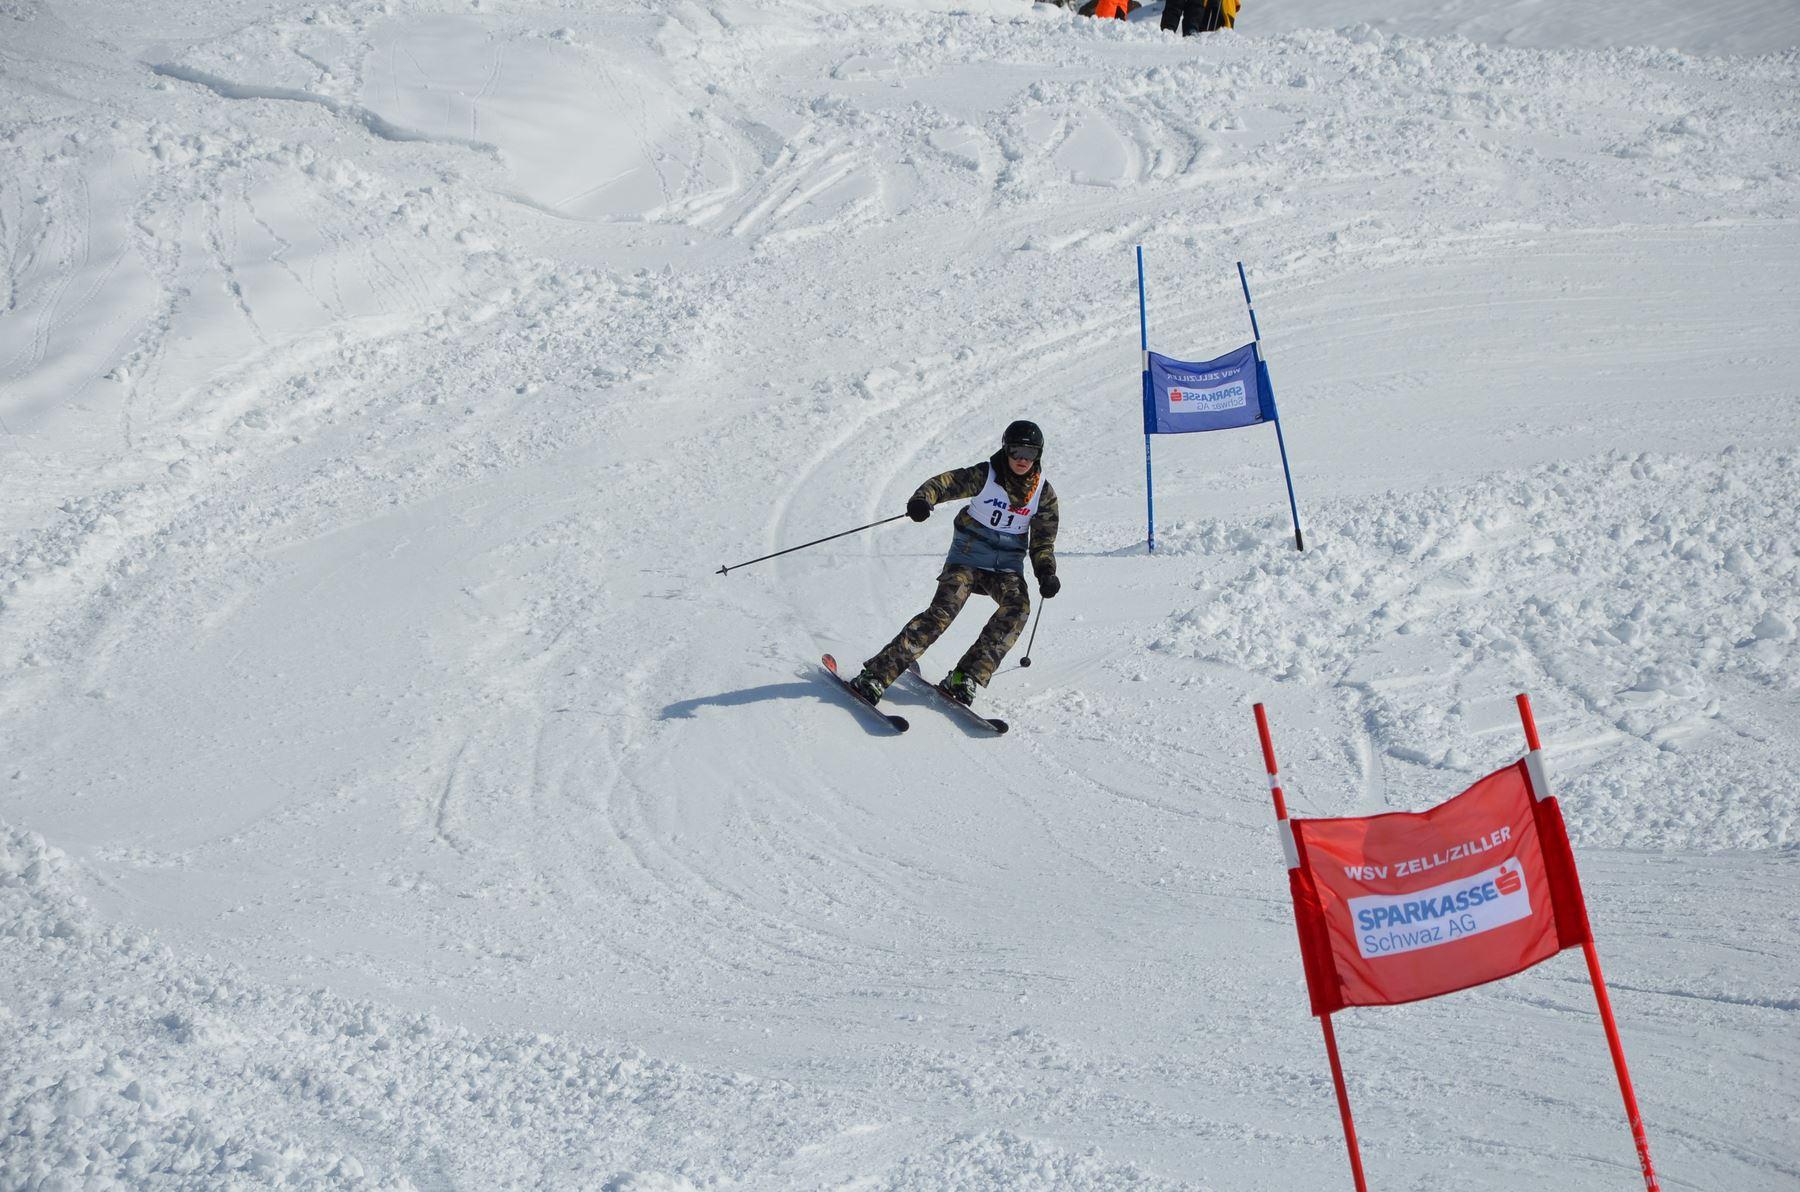 2015-03-22 BV Zillertal Skirennen 130.JPG